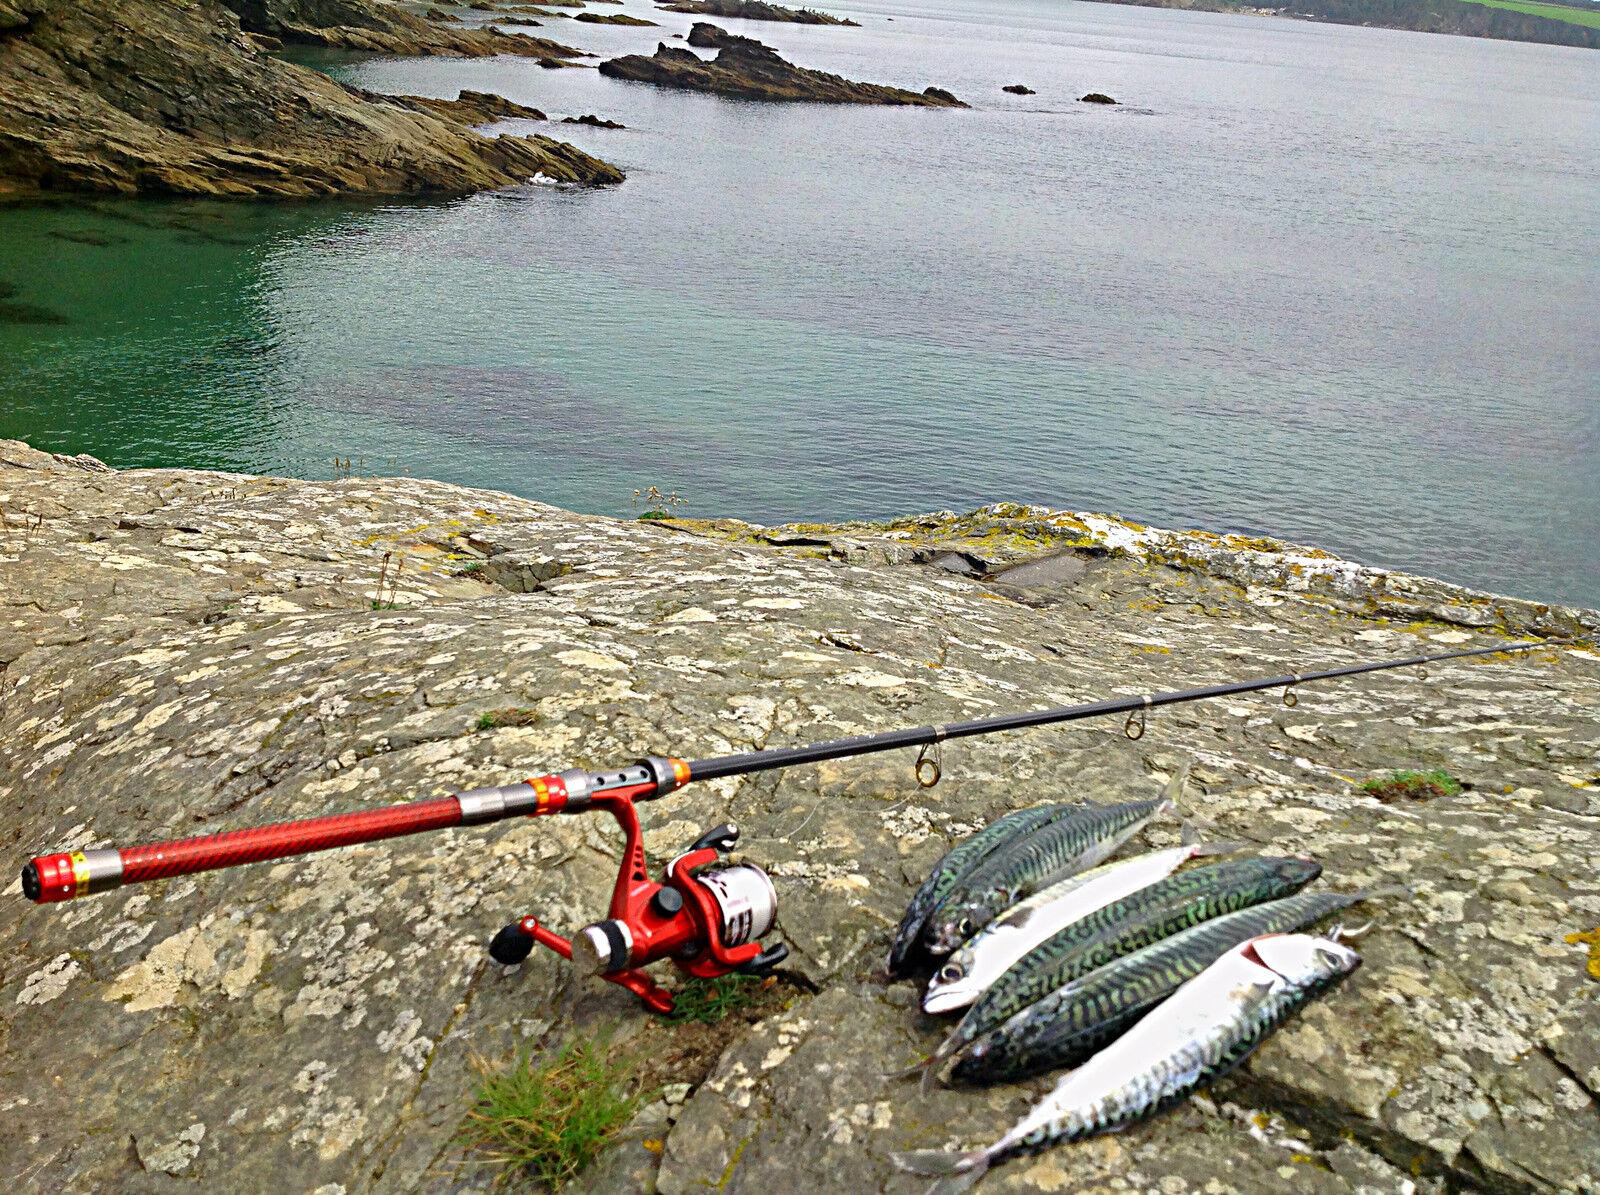 BEACH FISHING ROD & REEL SEA ROD TRAVEL ROD TELESCOPIC ROD SPINNING ROD SURF ROD